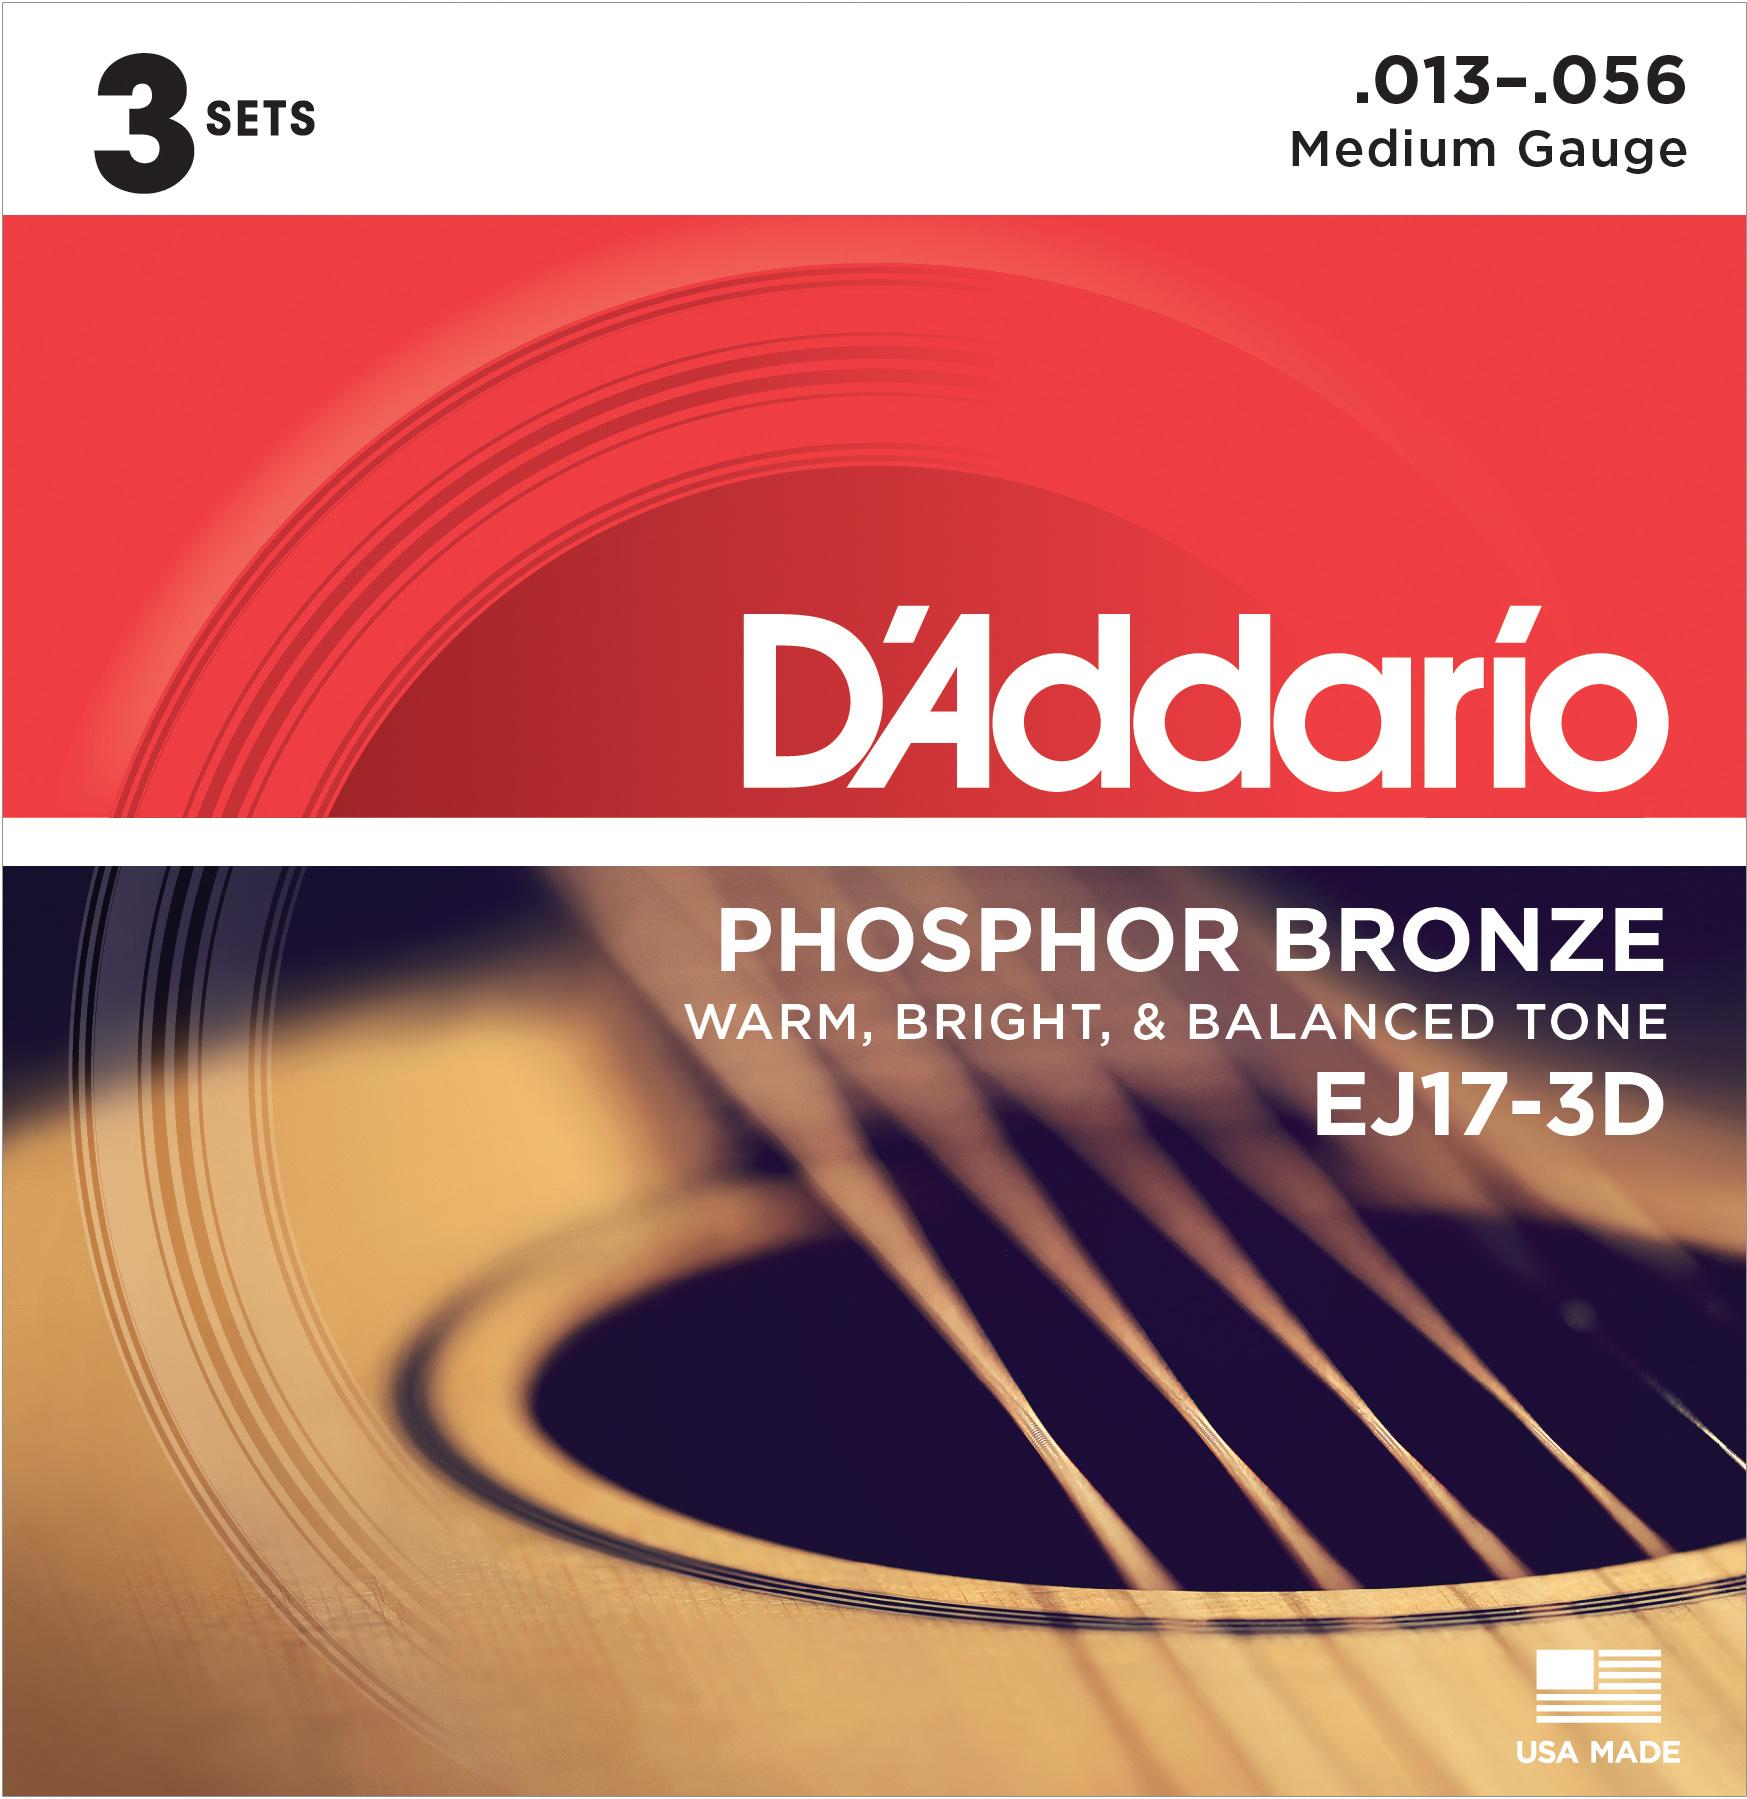 D'Addario EJ17-3D Phosphor Bronze Acoustic Guitar Strings, Medium, 13-56, 3 Sets